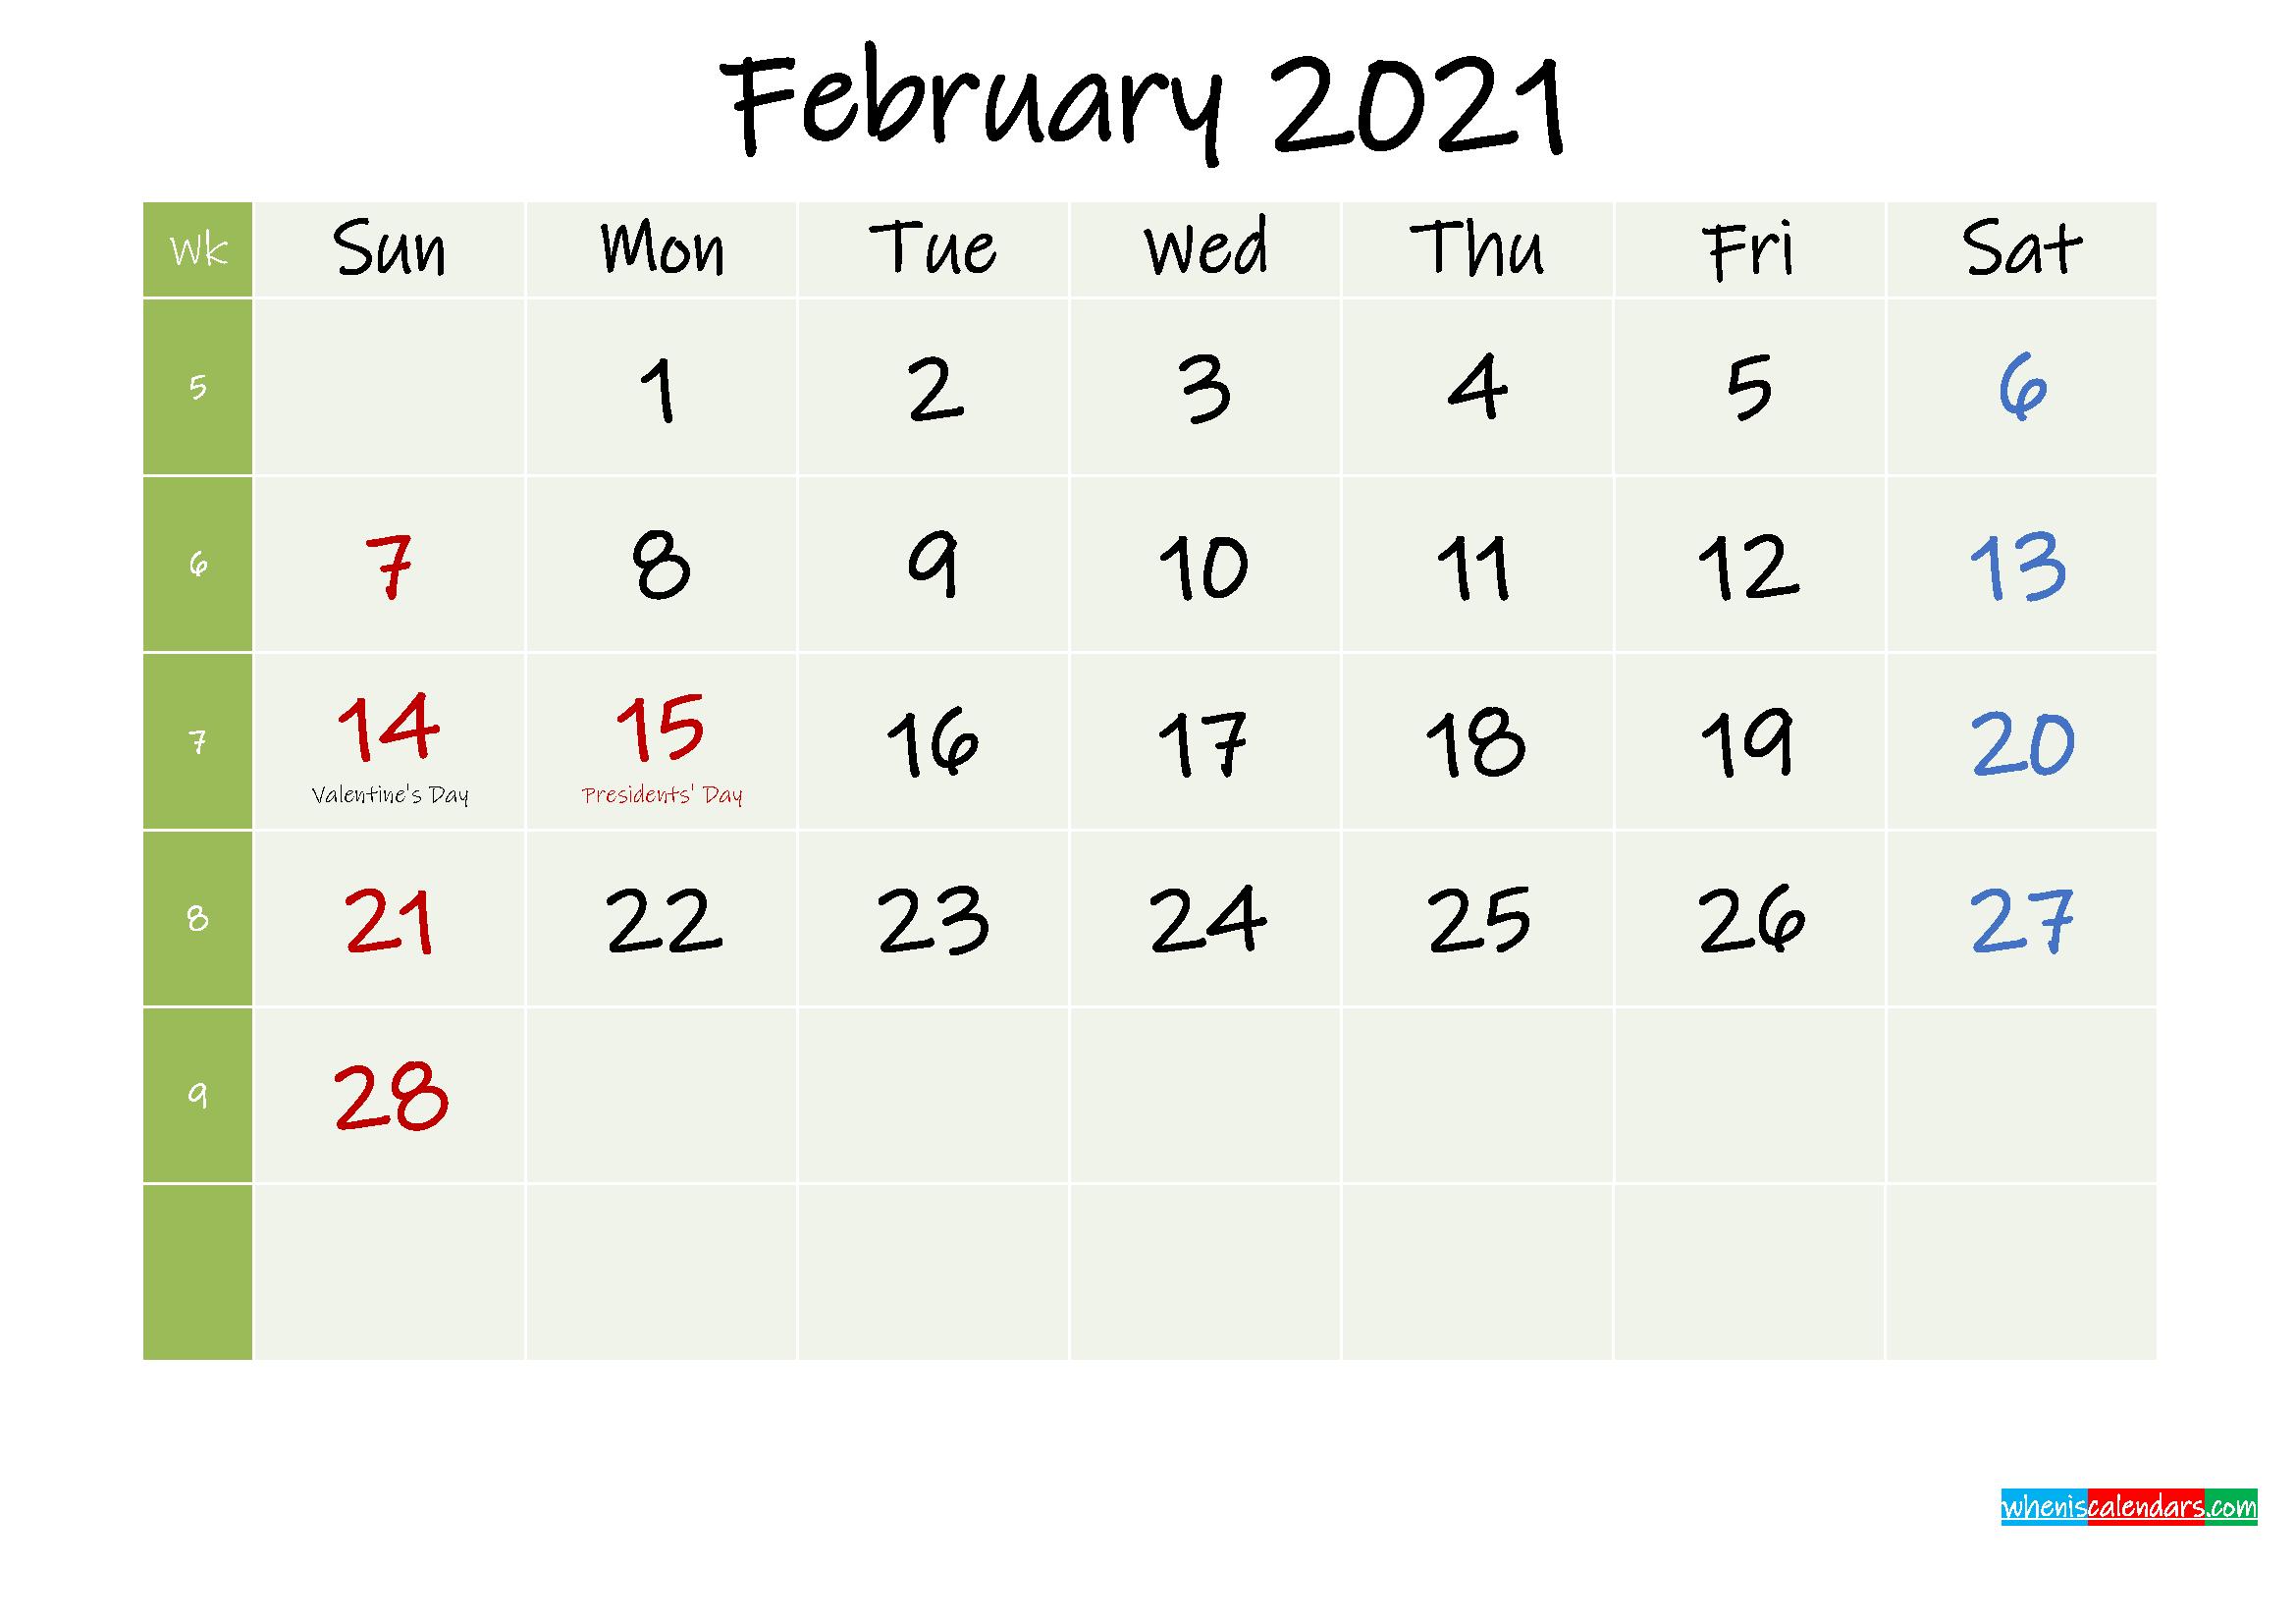 February 2021 Calendar with Holidays Printable